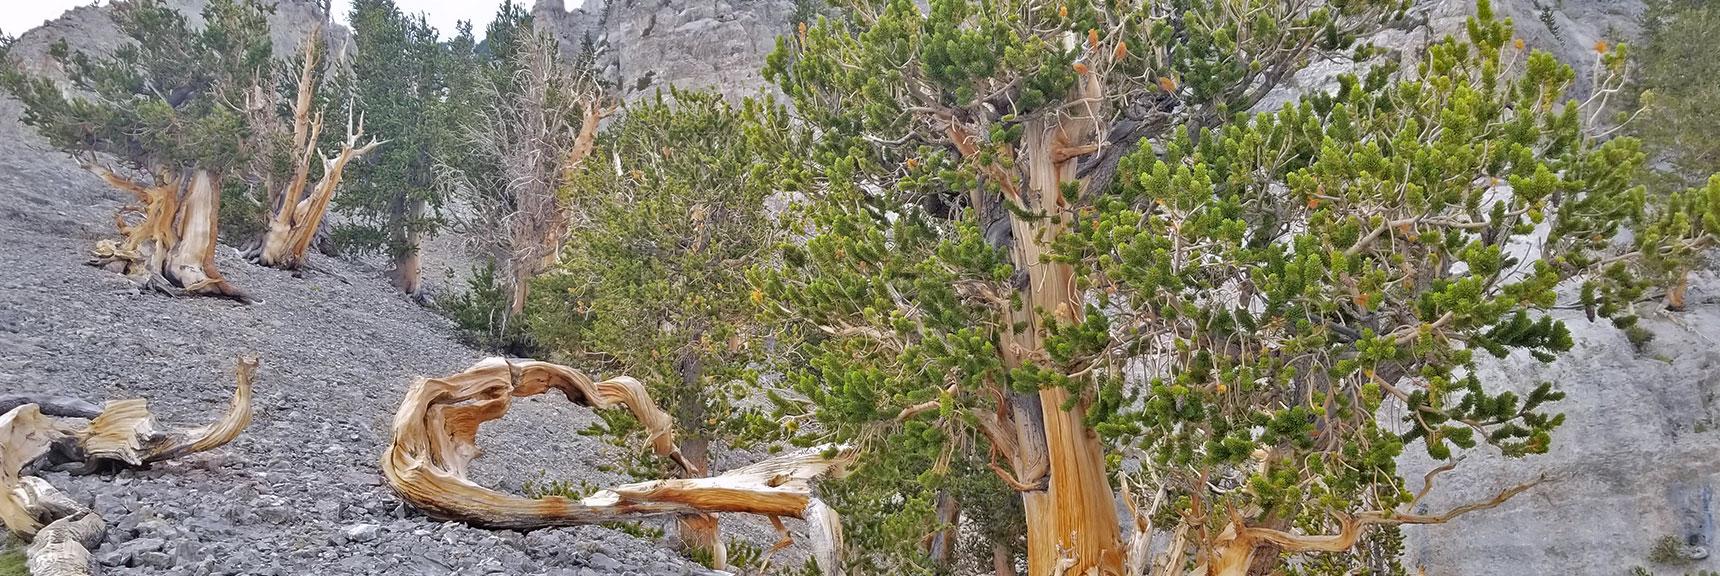 Mummy Mountain North Exotic Ancient Bristlecone Pines, Nevada